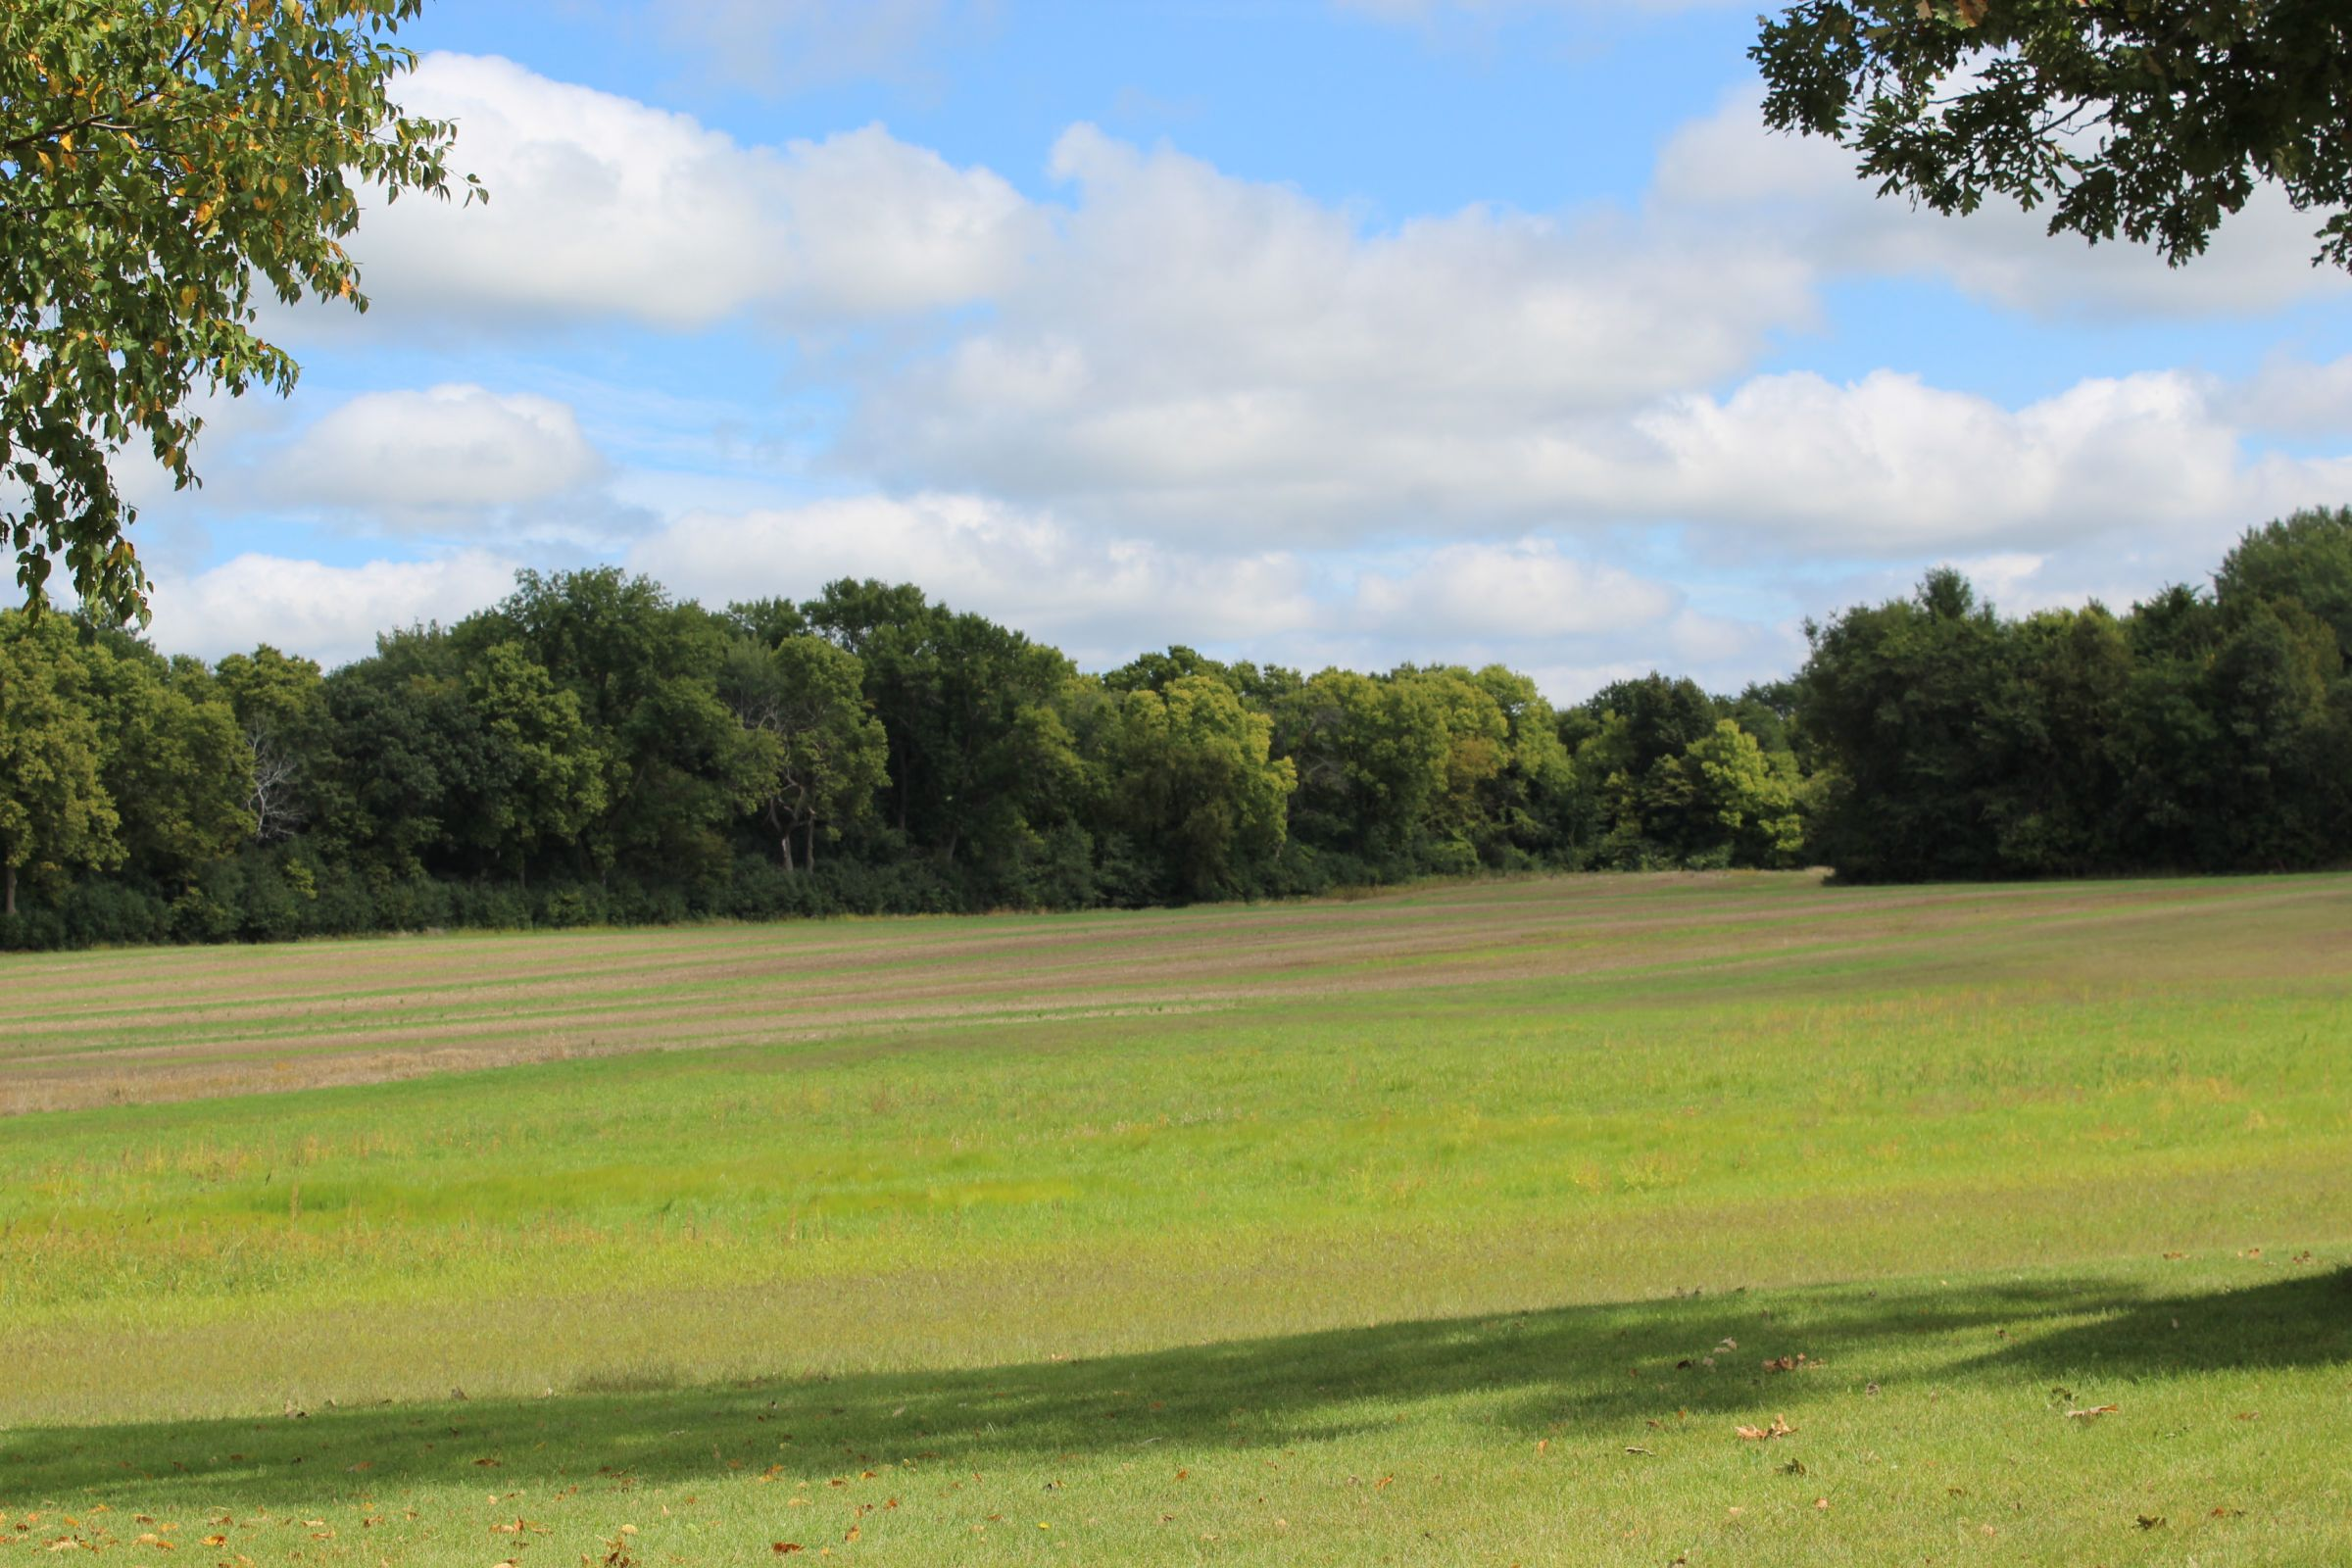 residential-land-mcleod-county-minnesota-80-acres-listing-number-15182-3-2020-09-23-163823.JPG